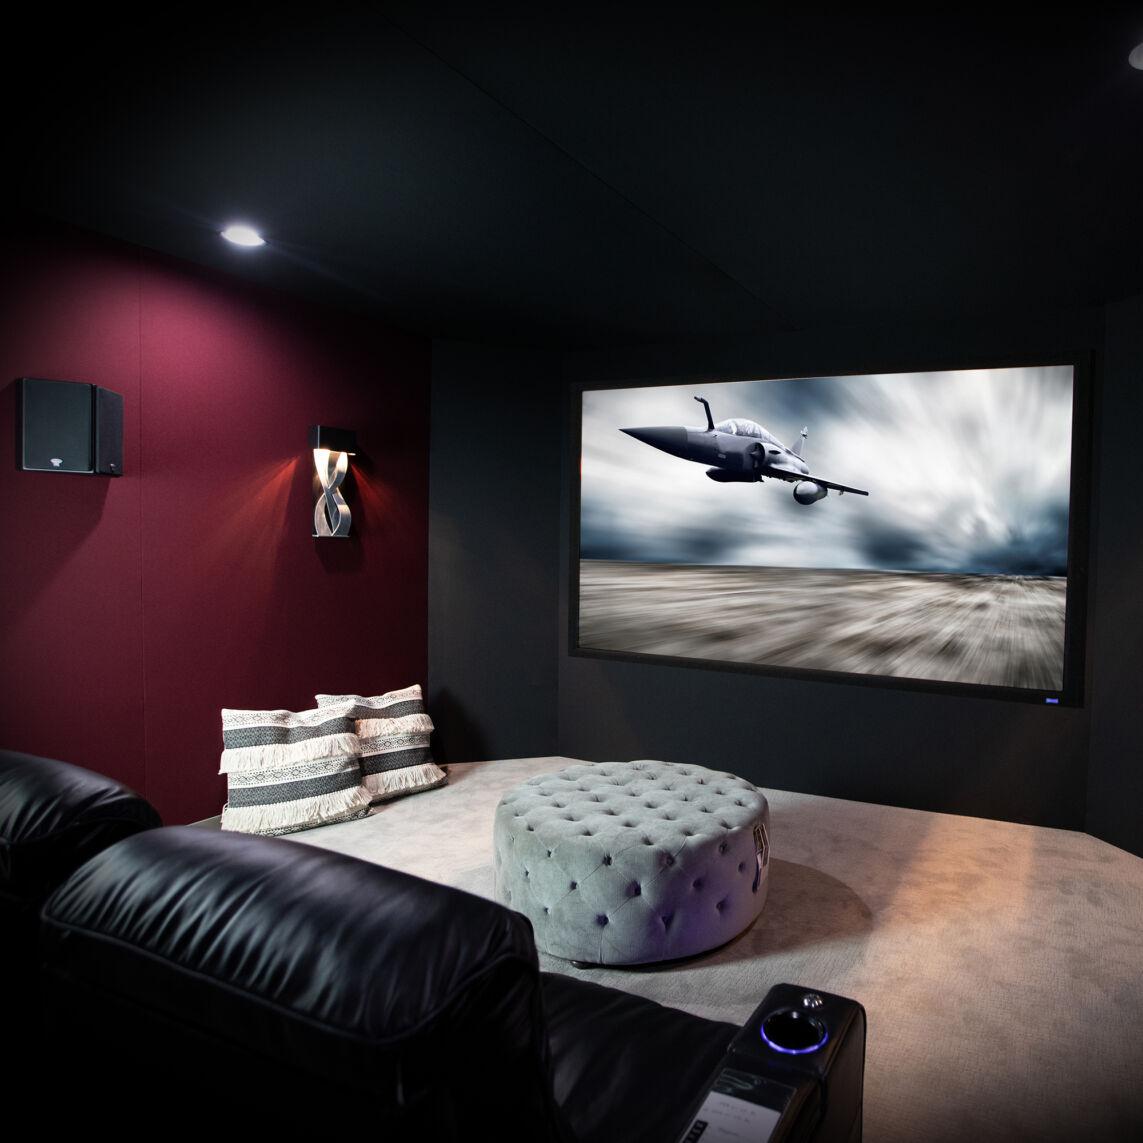 RCC 122 in theater plane on screen